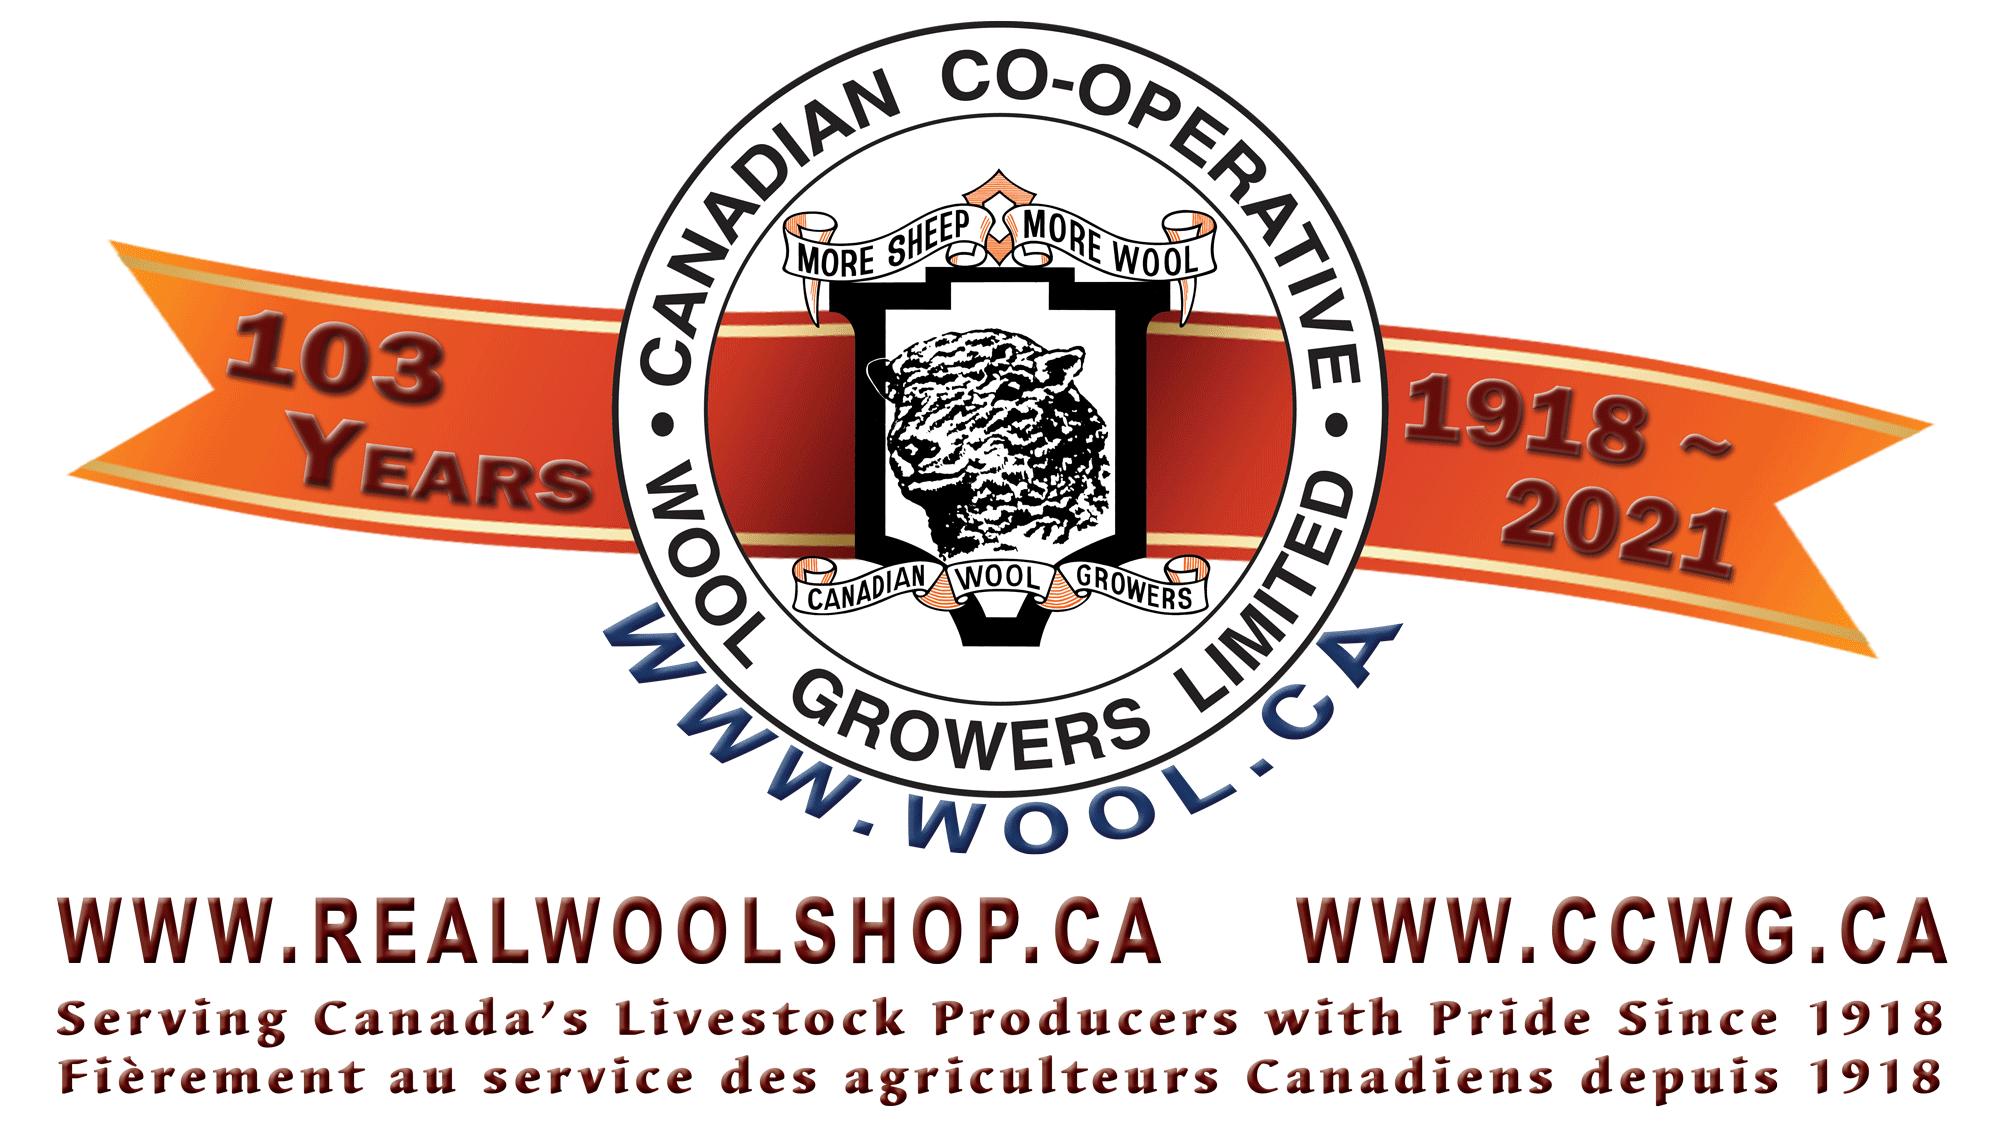 CCWG logo 103 years